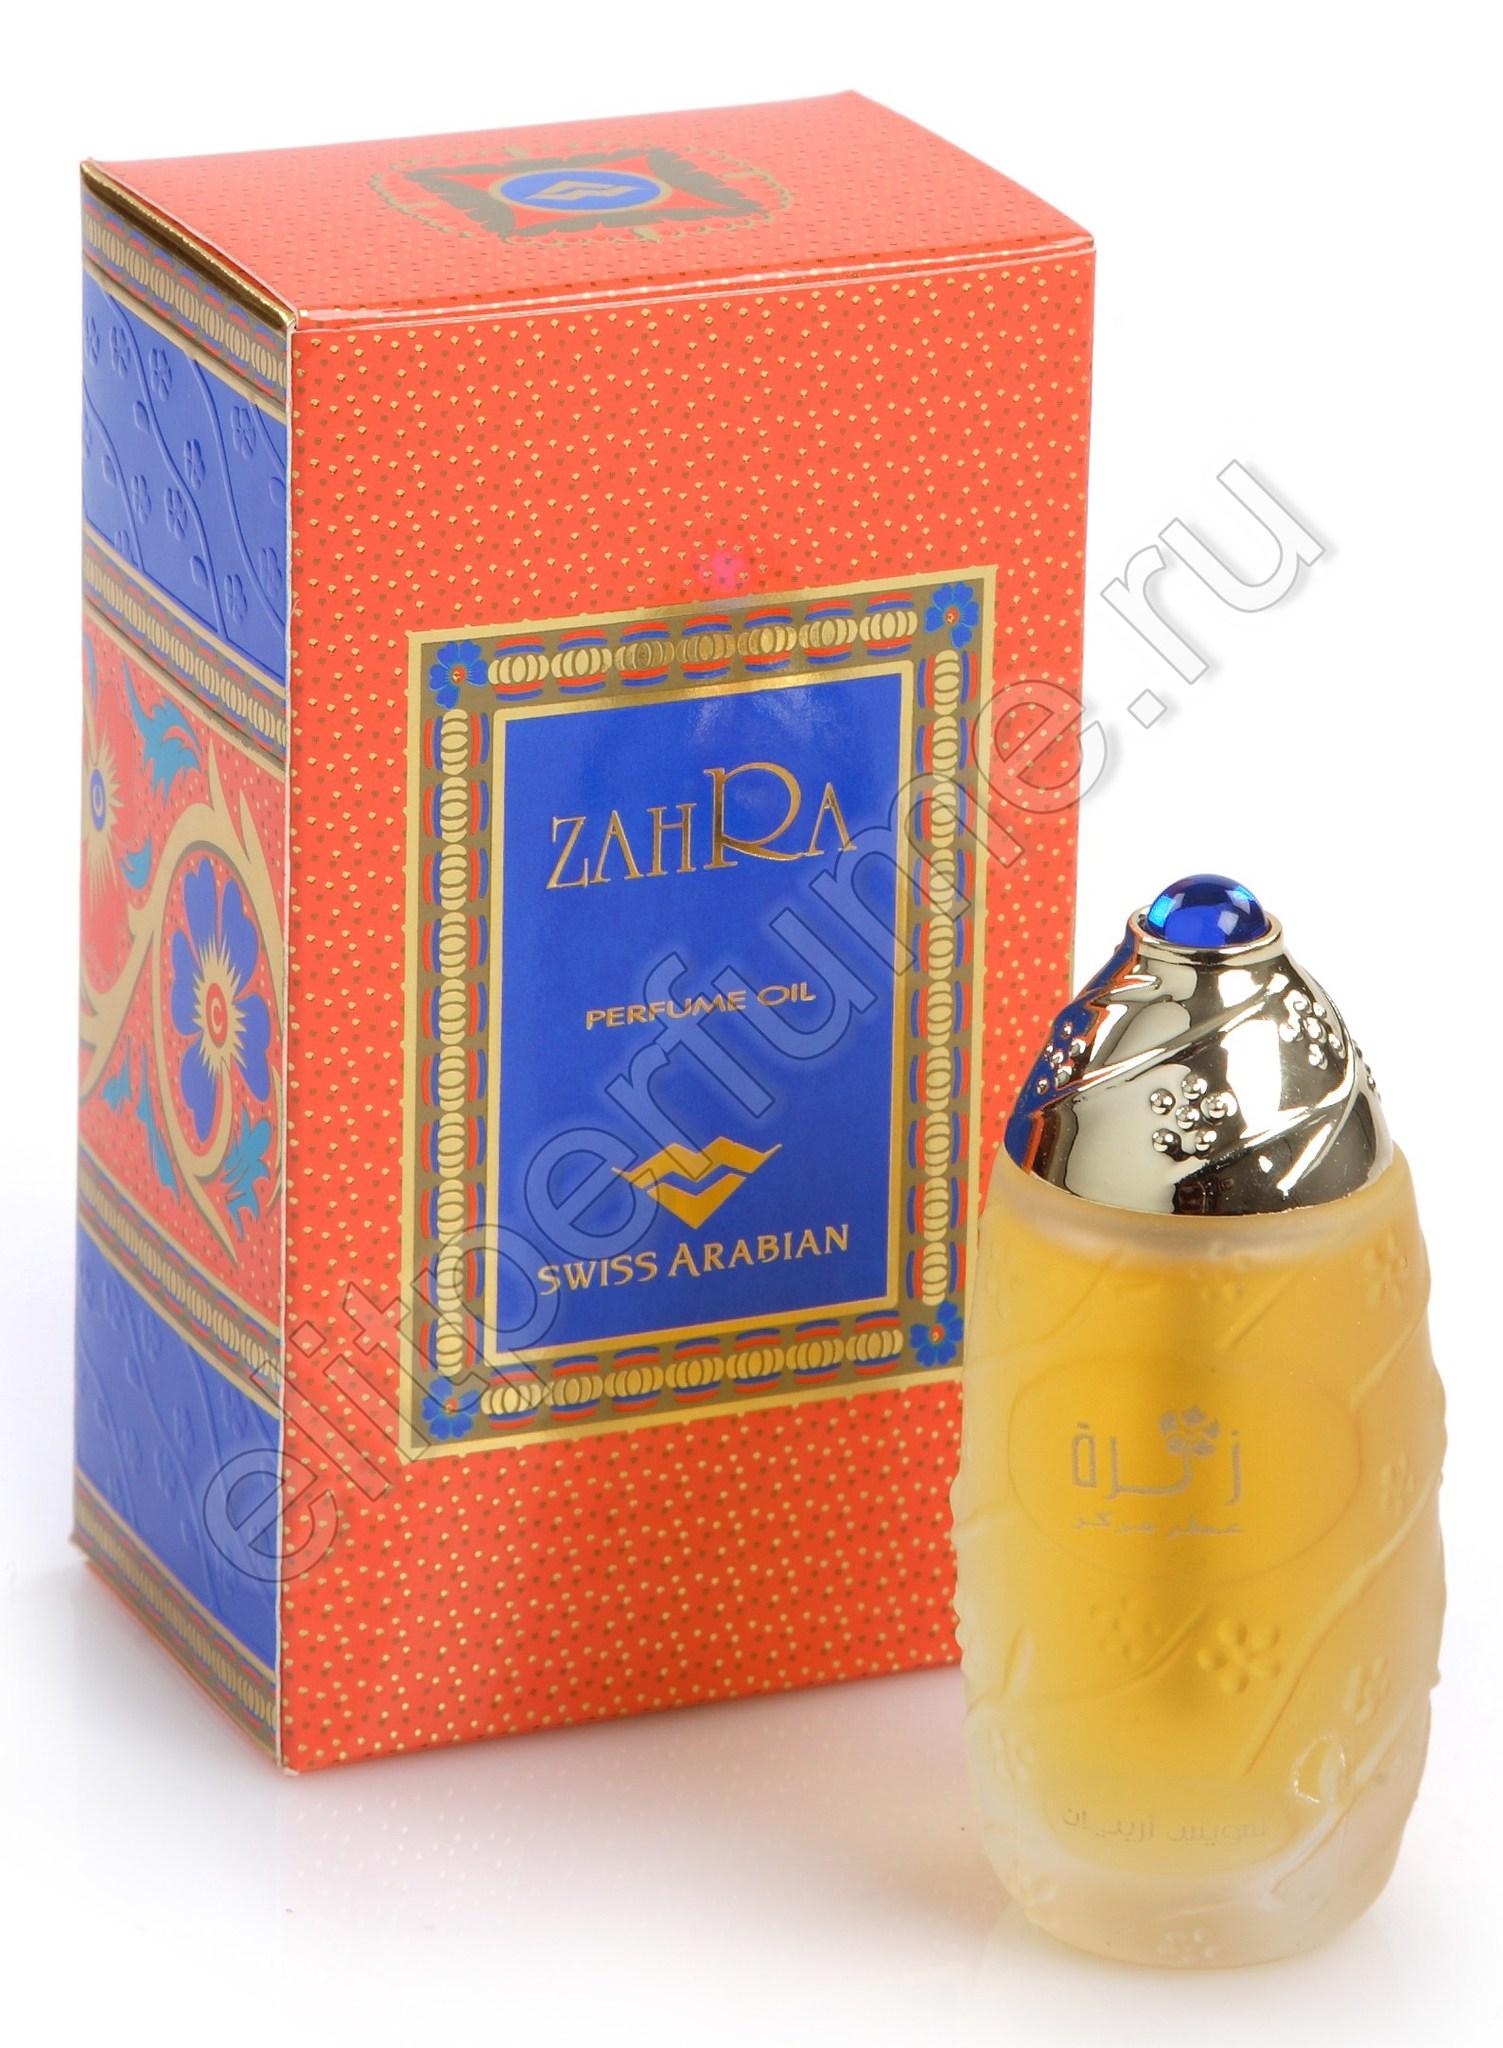 Захра Zahra 30 мл арабские масляные духи от Свисс Арабиан Swiss Arabian